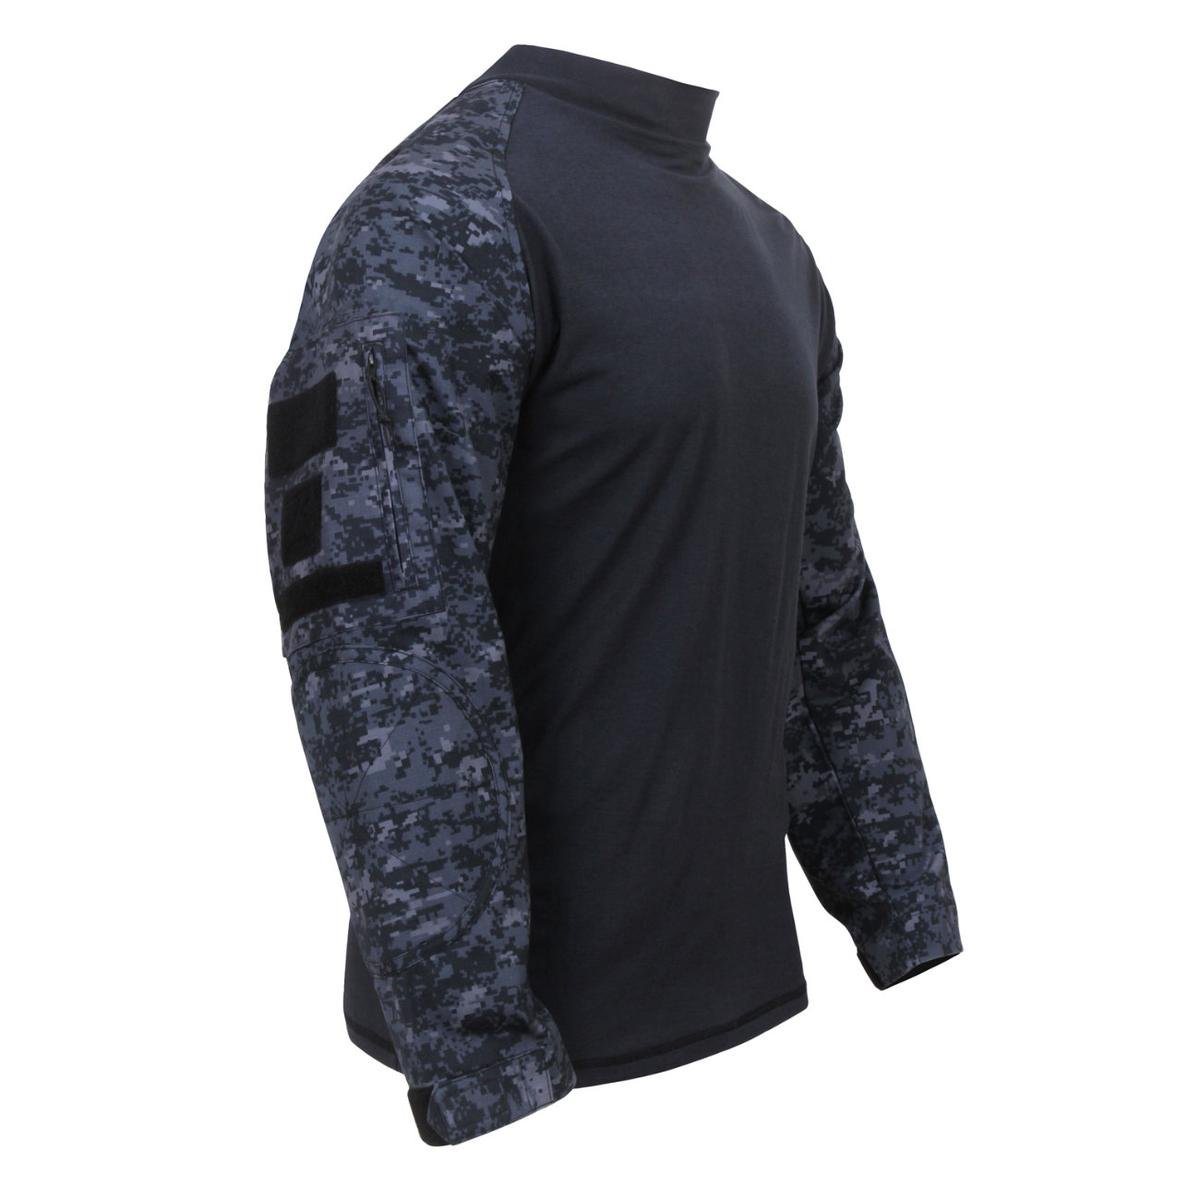 Rothco Military FR NYCO Combat Shirt - Midnite Digital Camo B01M99FA03